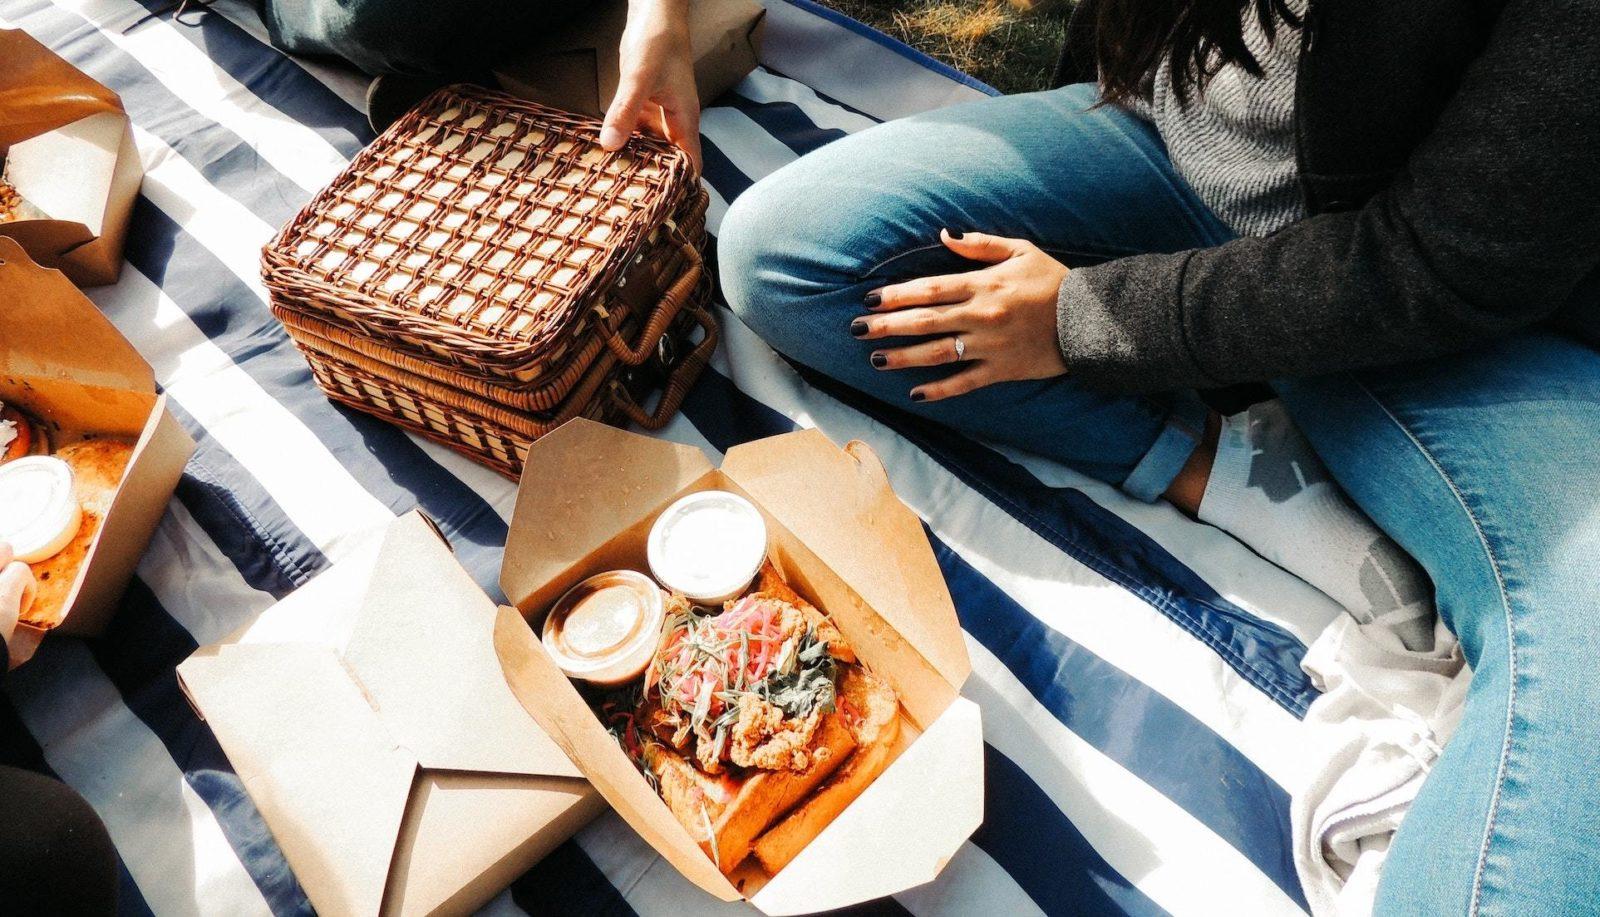 Online ordering picnic